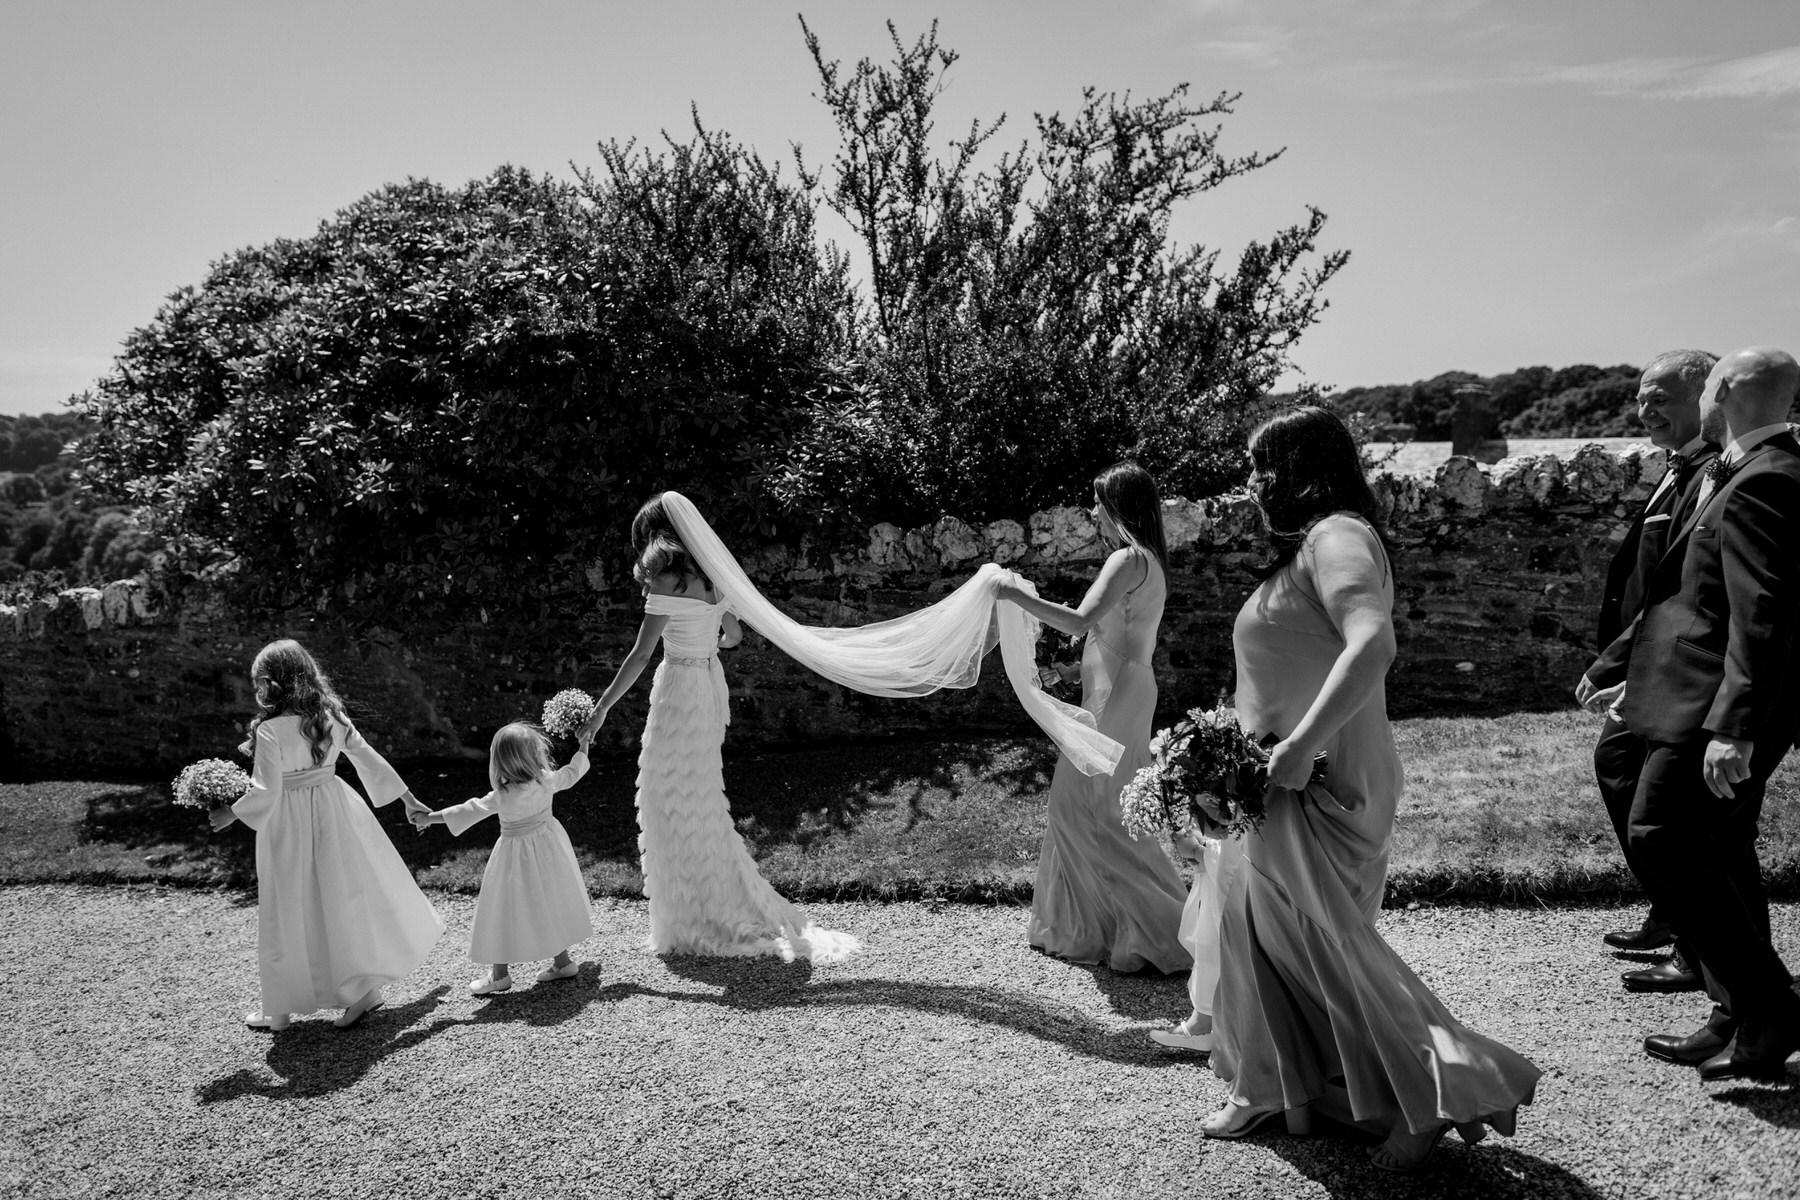 boconnoc estate wedding photography 053.jpg